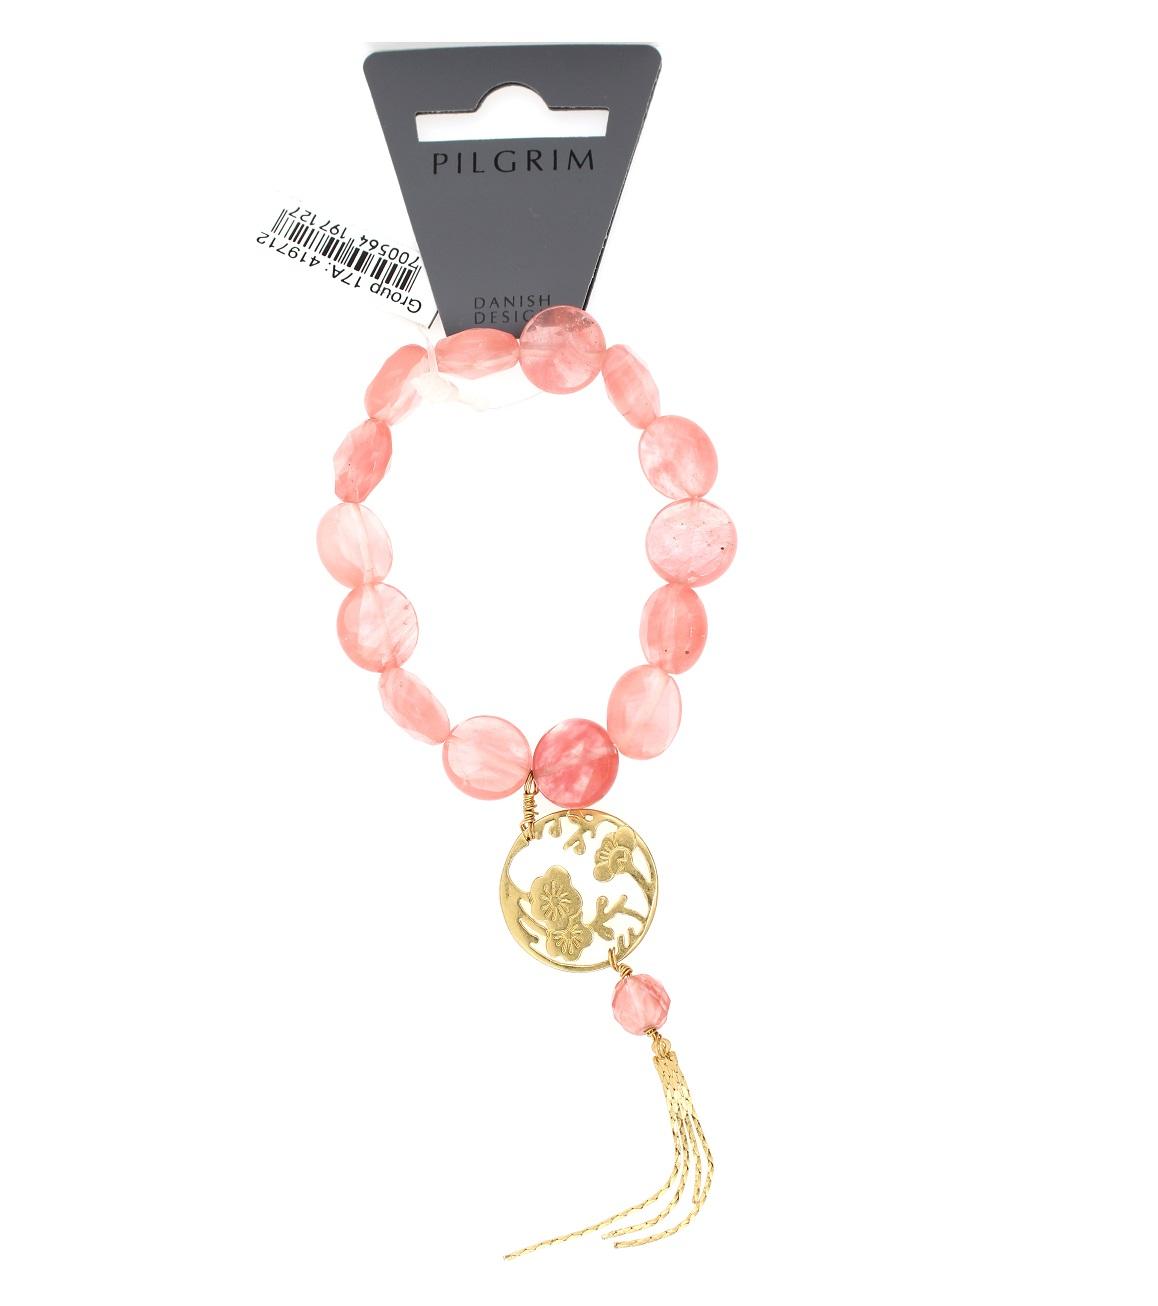 PILGRIM Oriental Bracelet Cherry Quartz & Silken Gold Plate BNWT